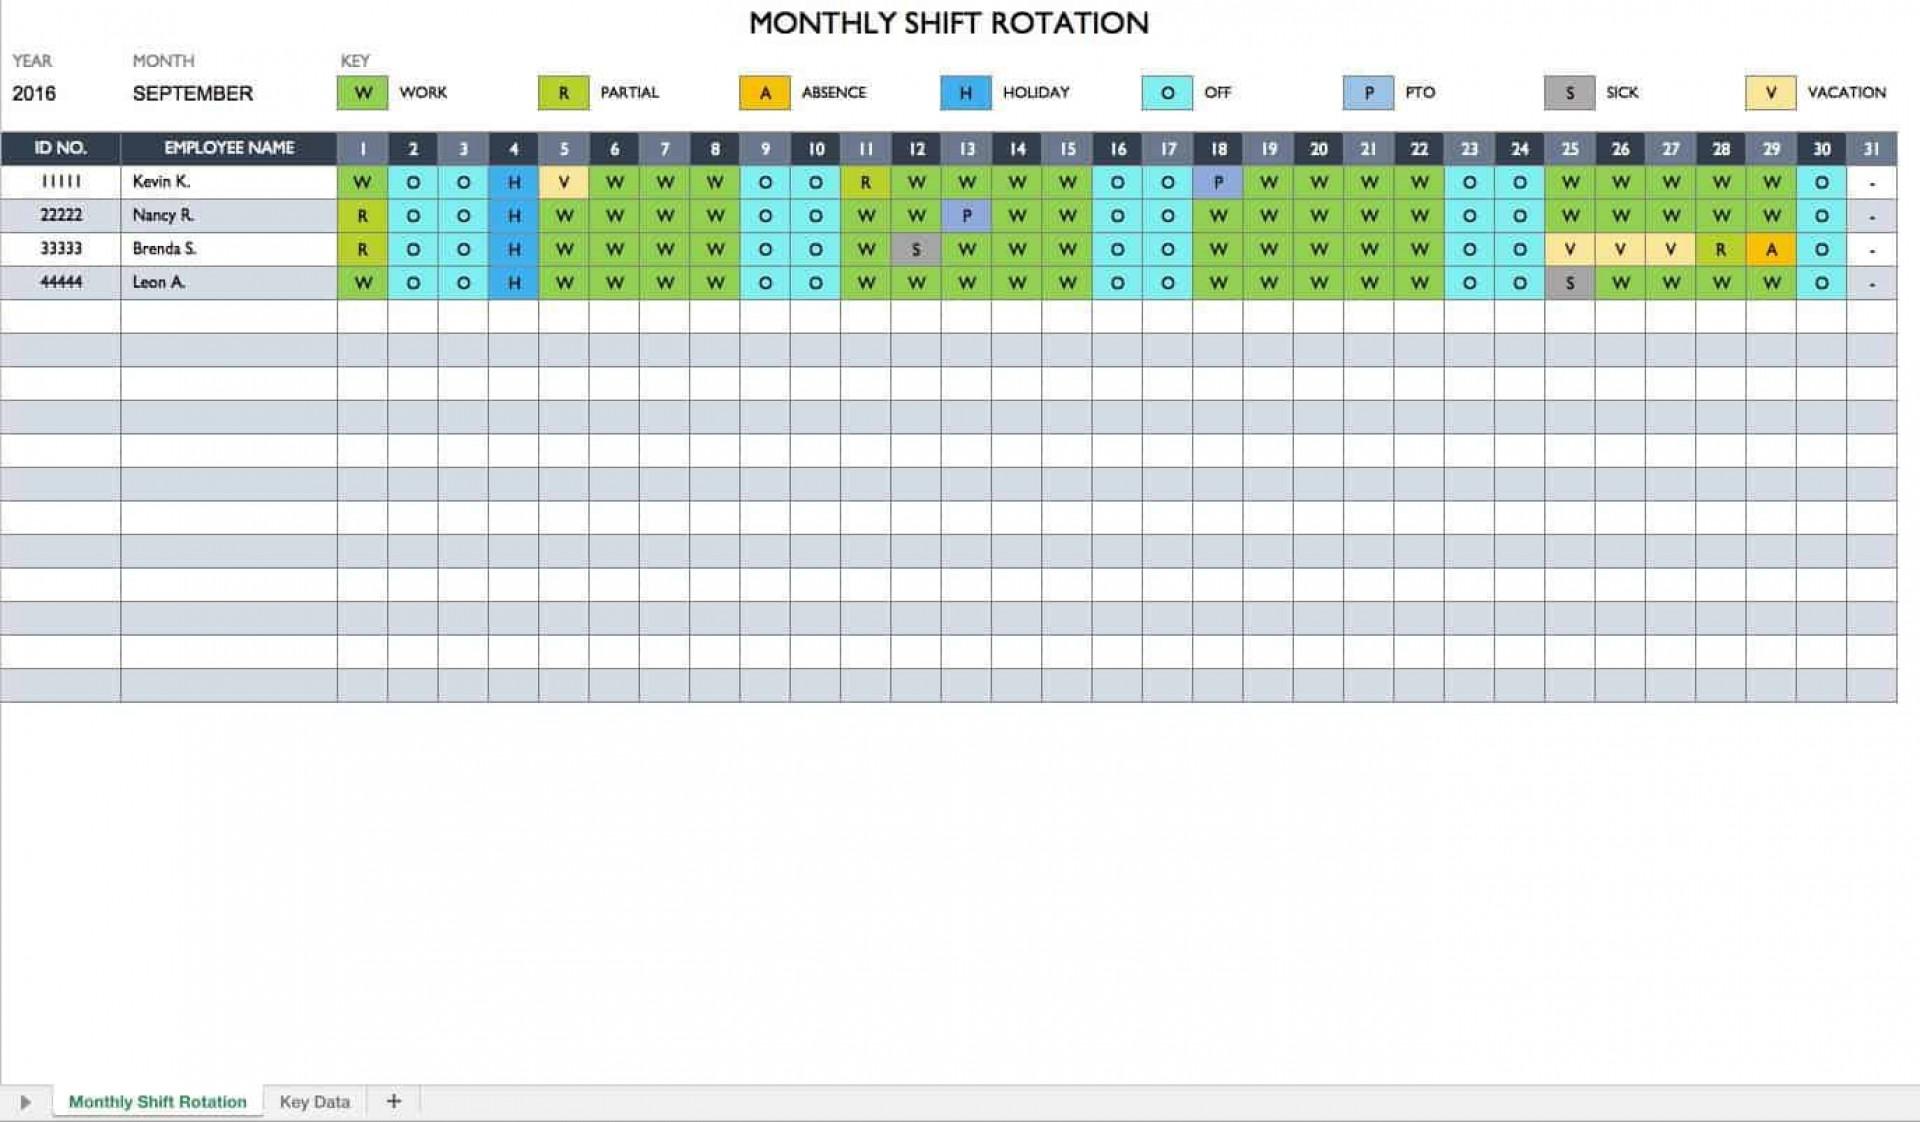 009 Striking Employee Calendar Template Excel High Def  Staff Leave Vacation Planner1920